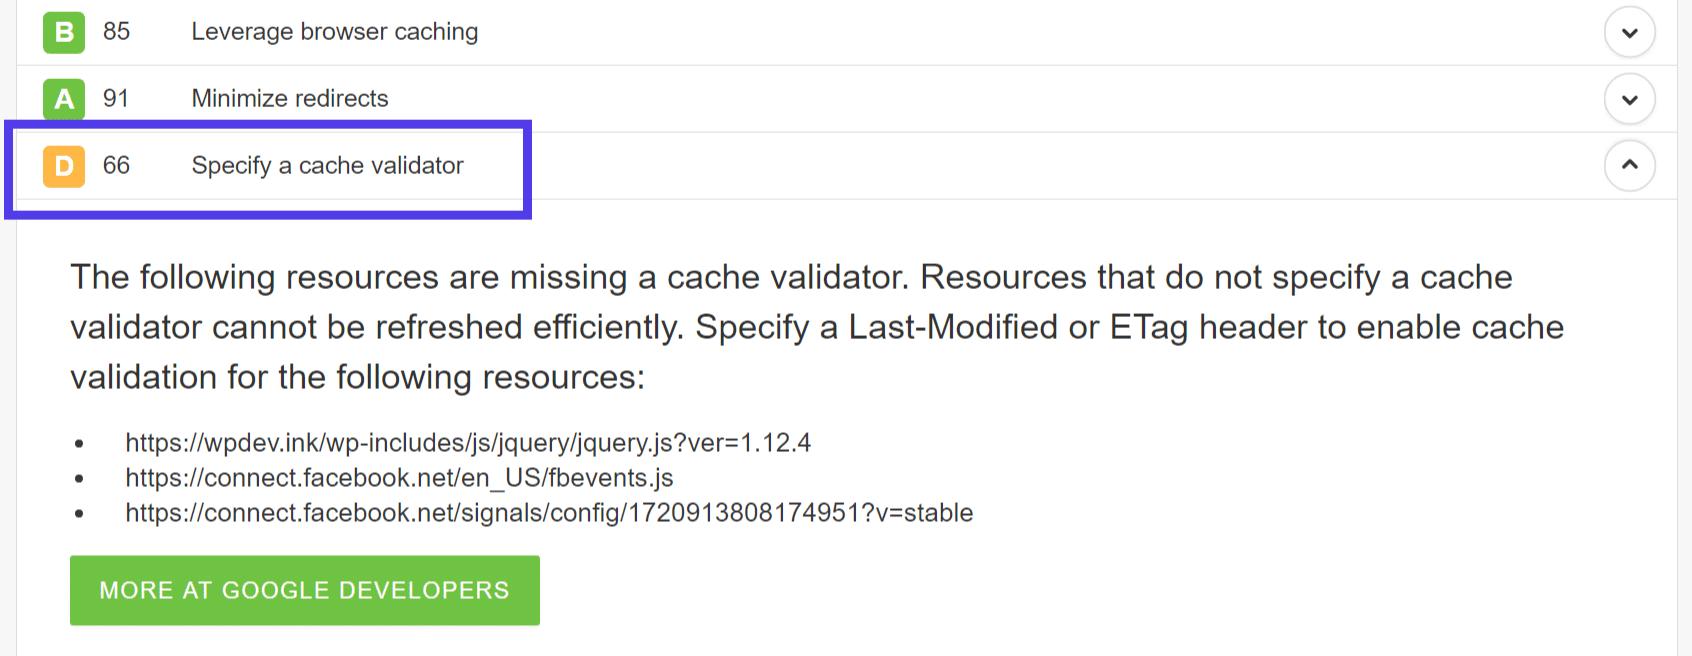 Angiv en cache validator advarsel